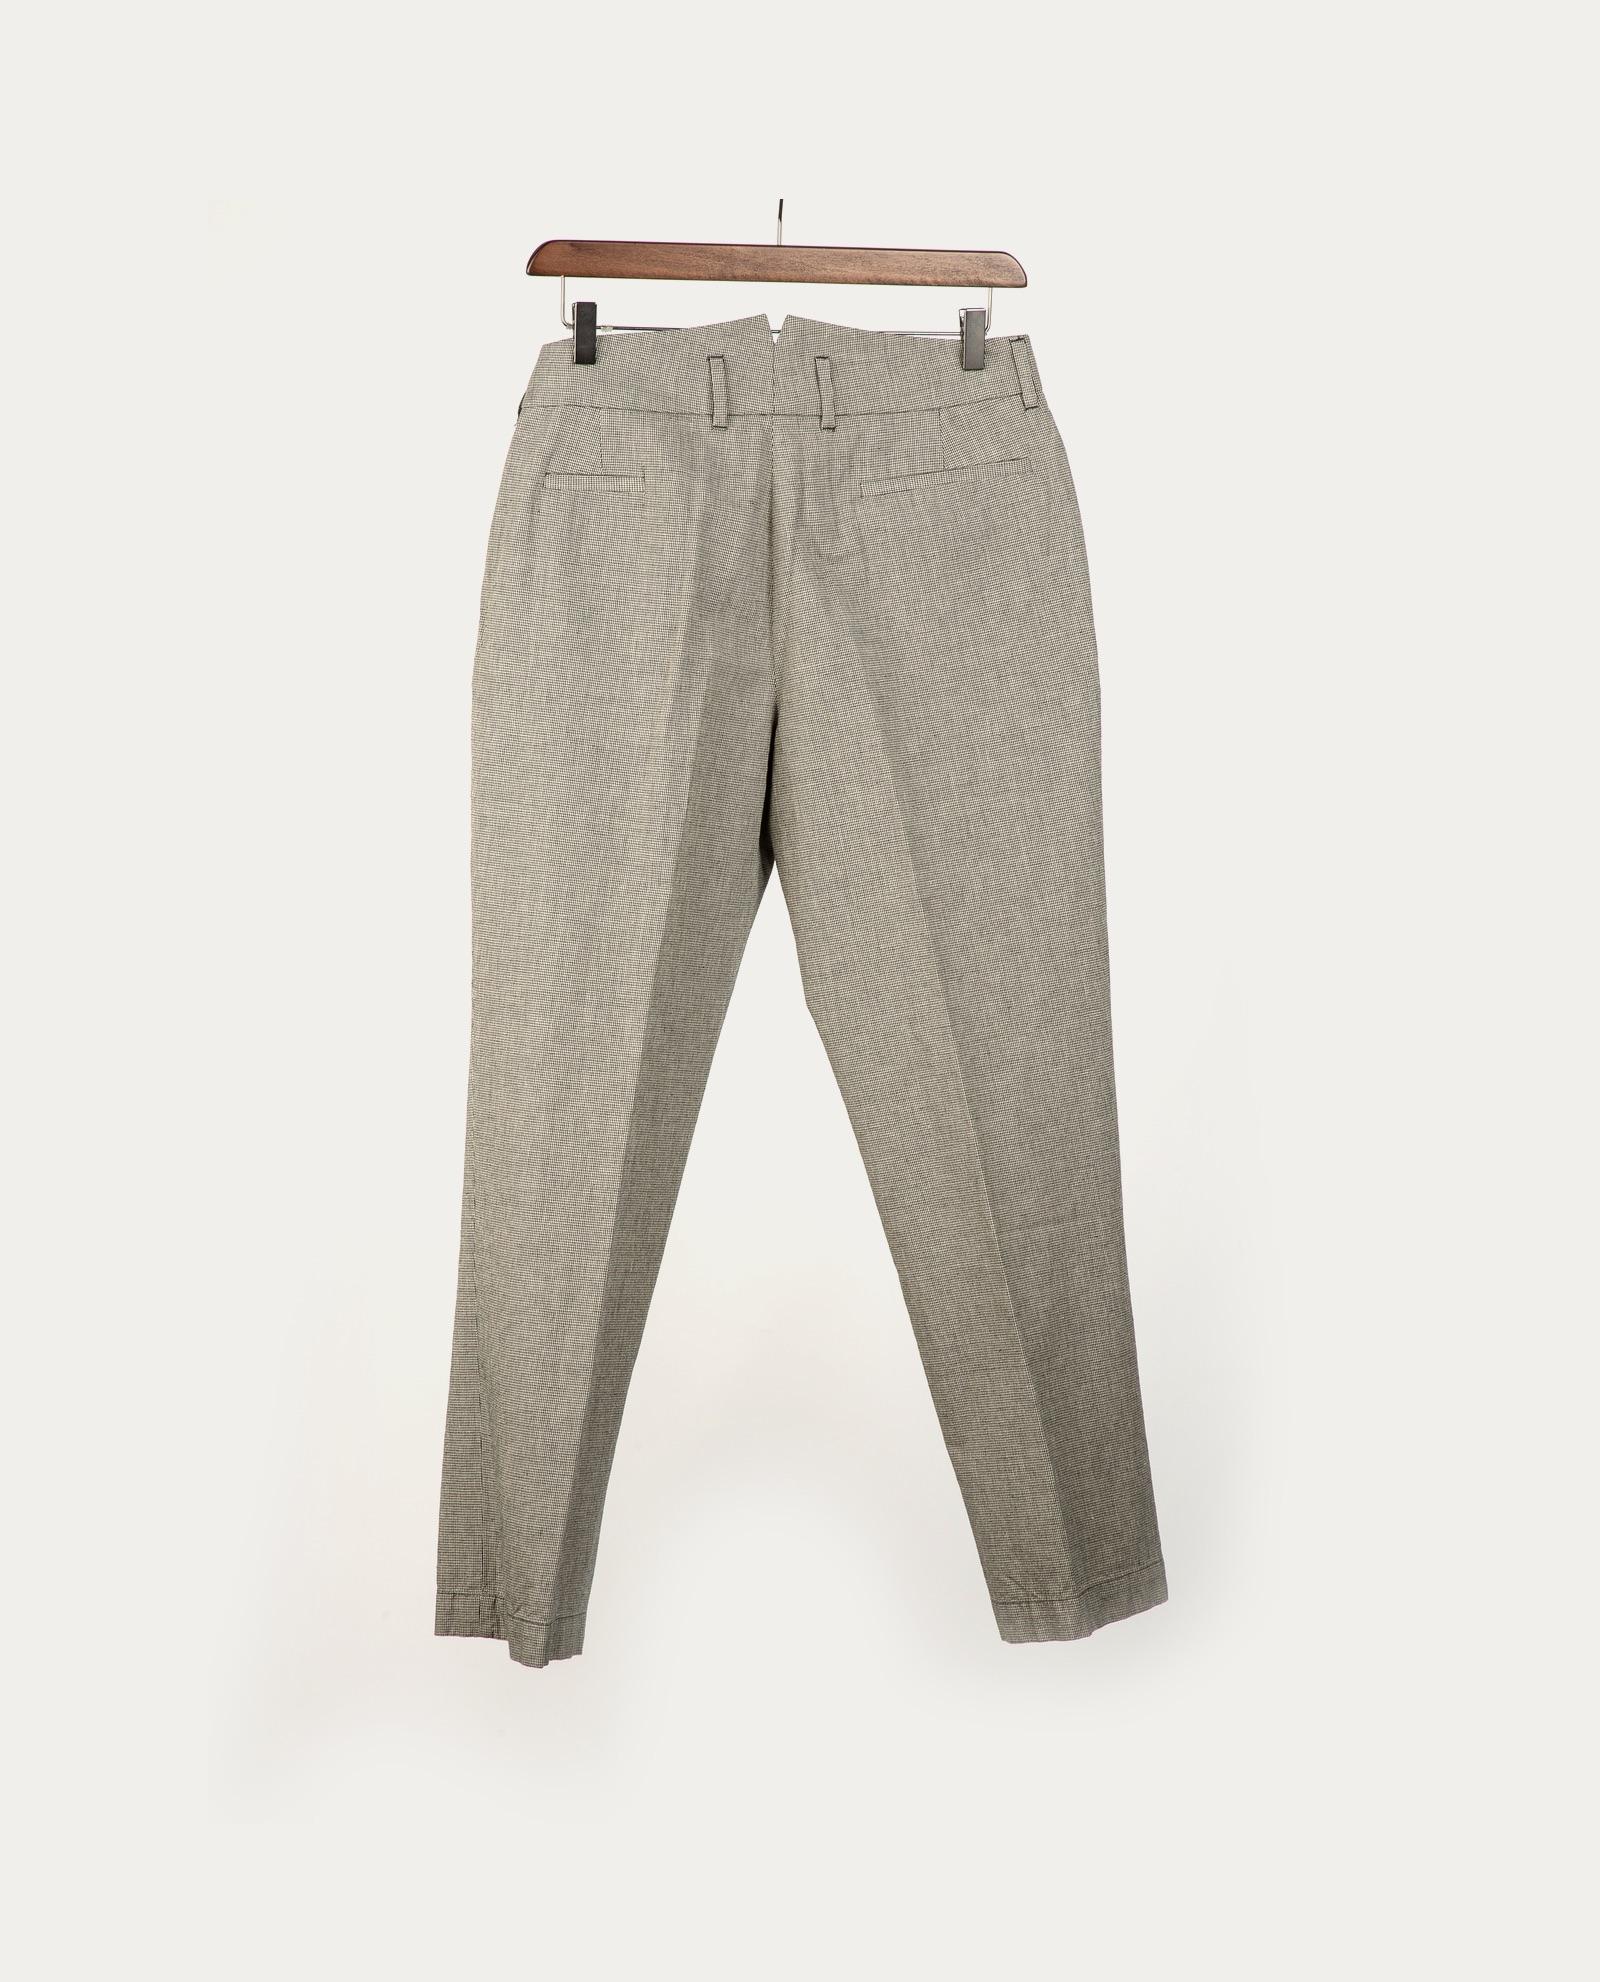 b Pantalon Miniera l Pied De A c Poule UpzMSGqV